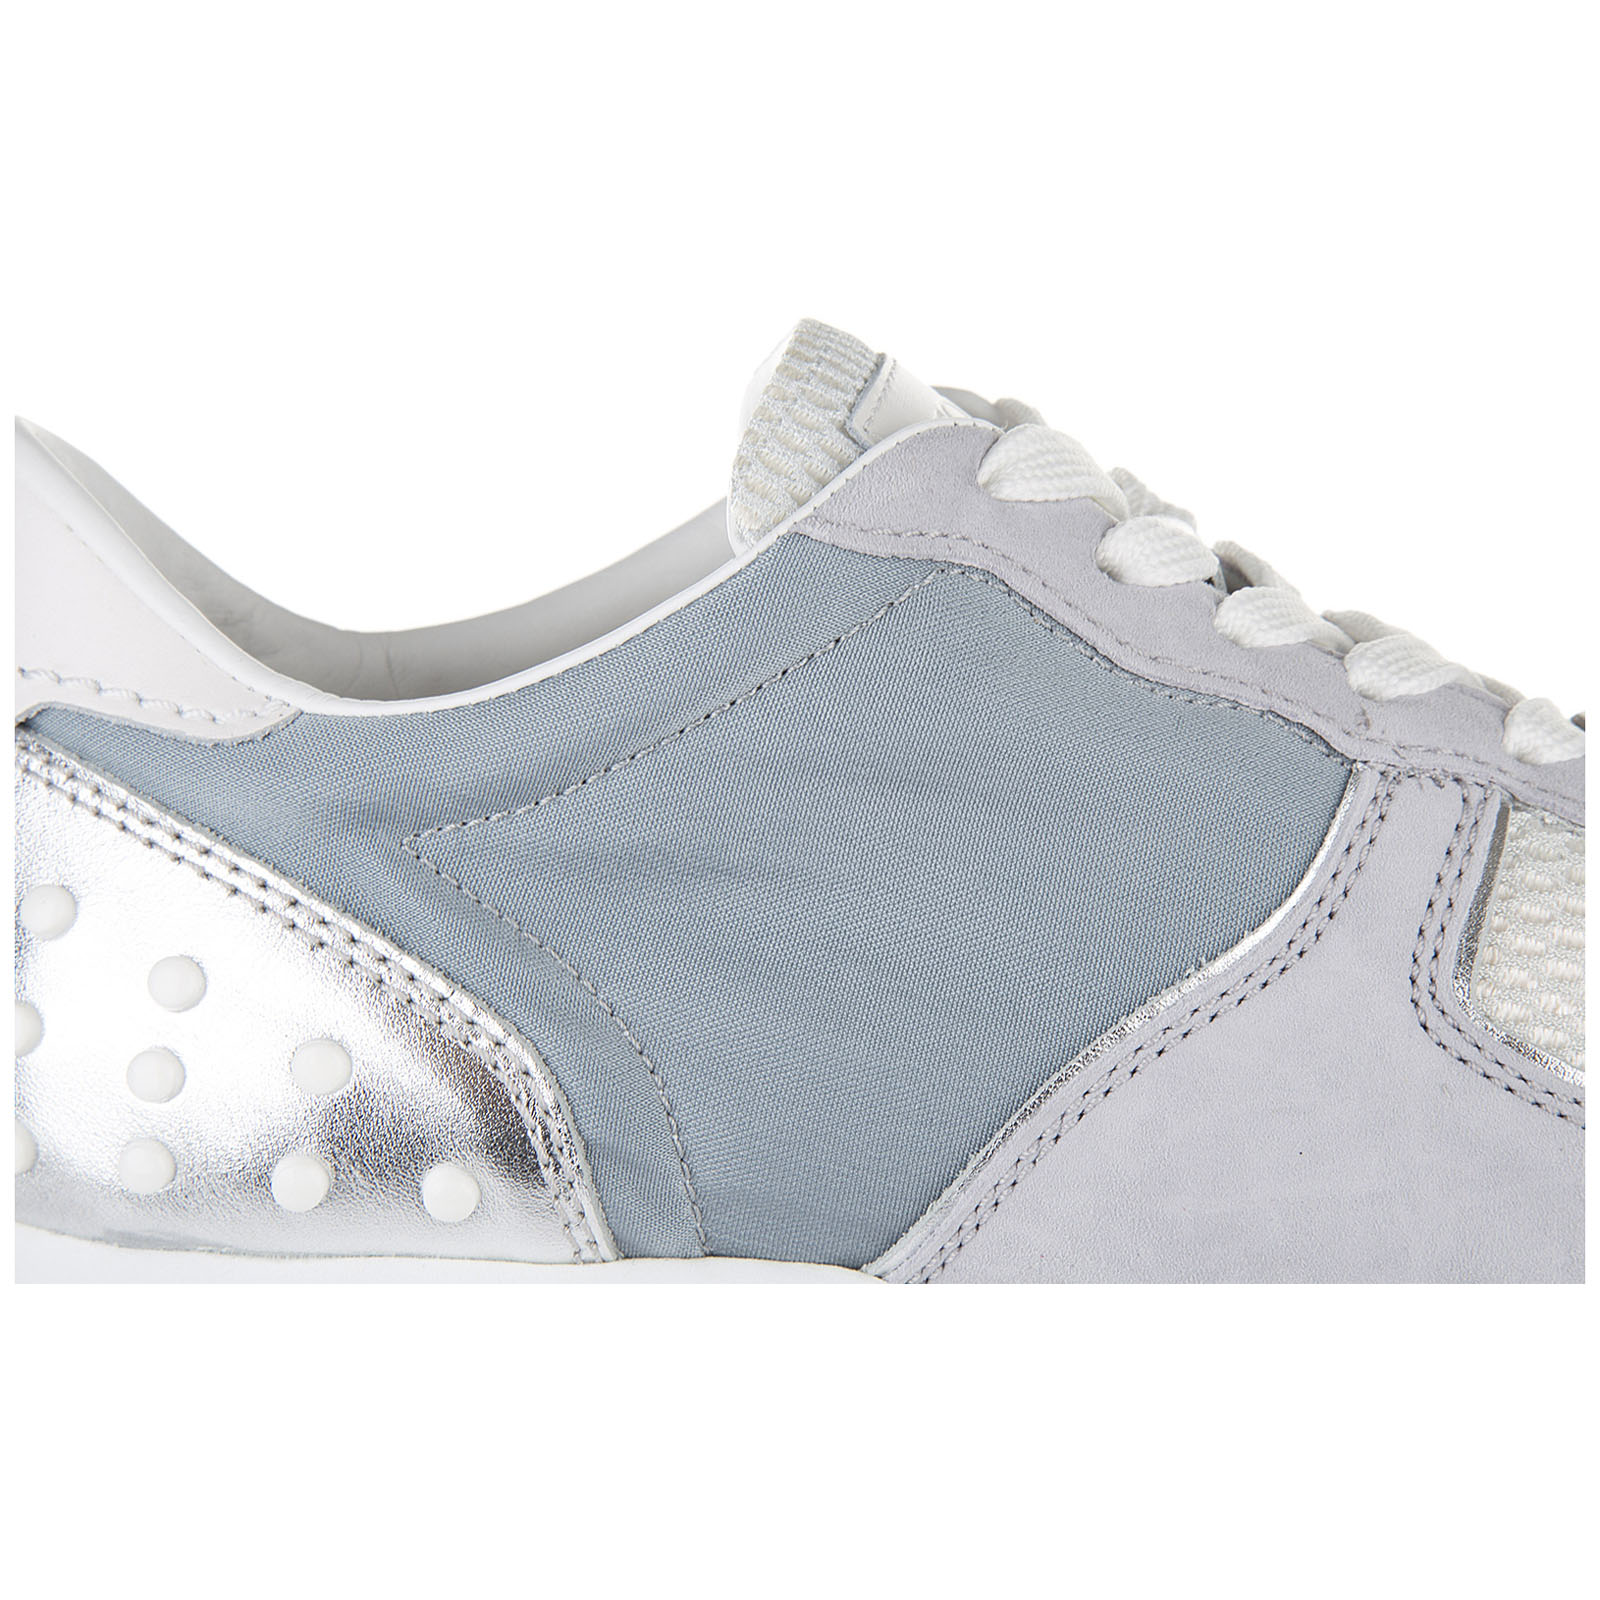 Zapatos zapatillas de deporte mujer en ante sportivo yo allacciata